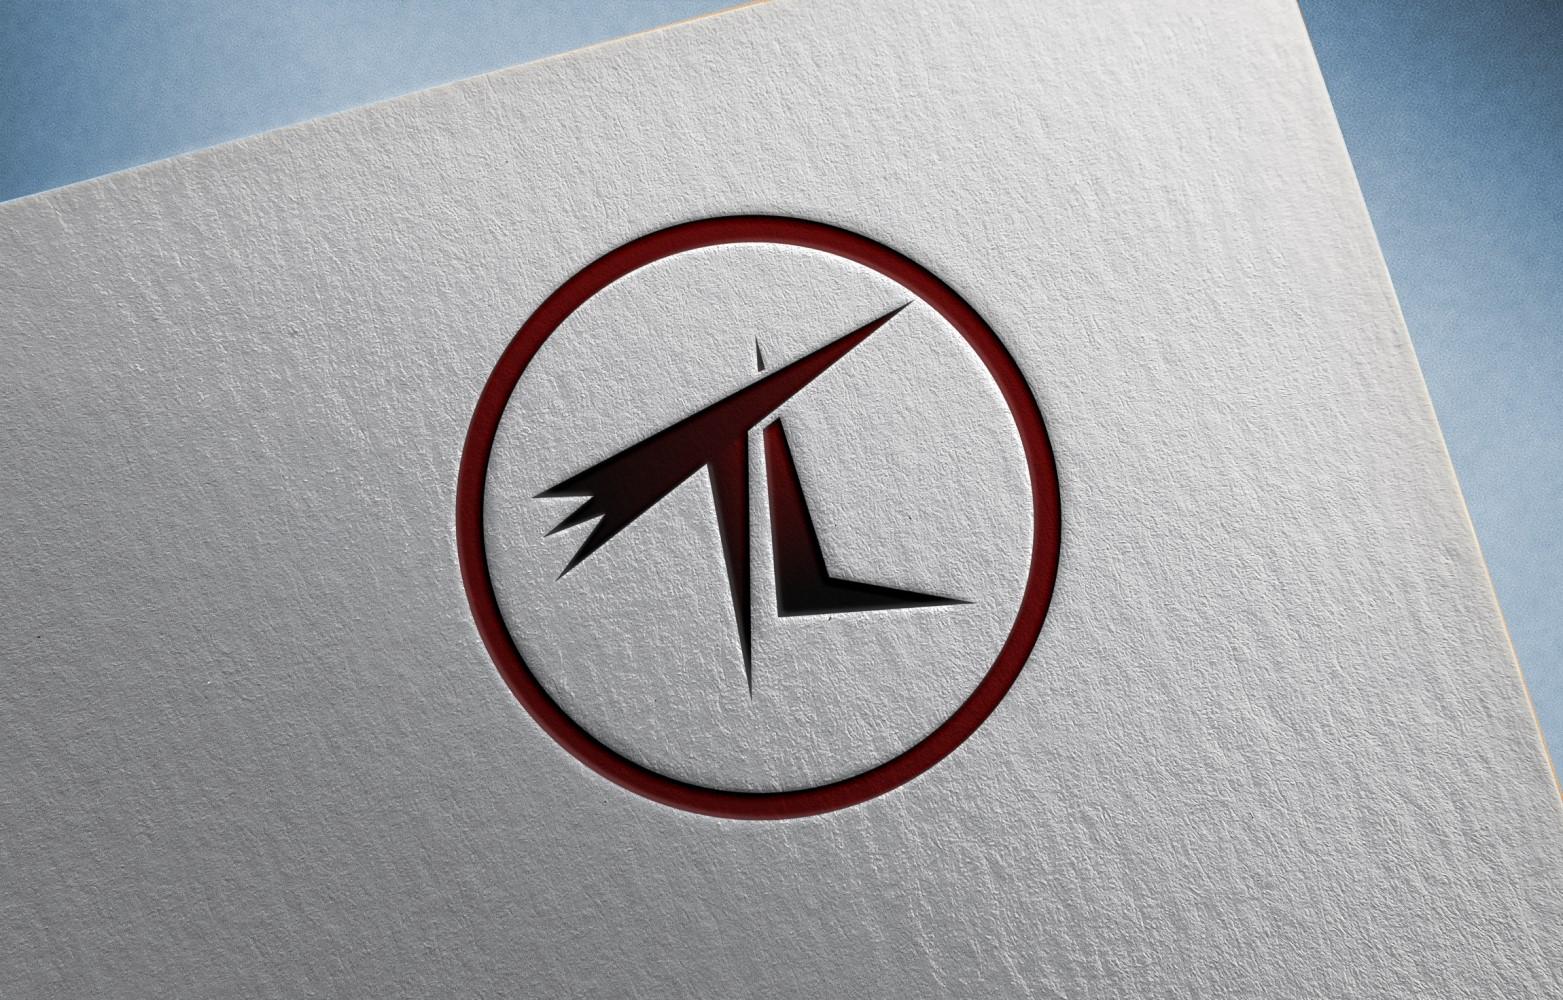 Разработка логотипа для тюнинг ателье фото f_0275f442407acbf3.jpg